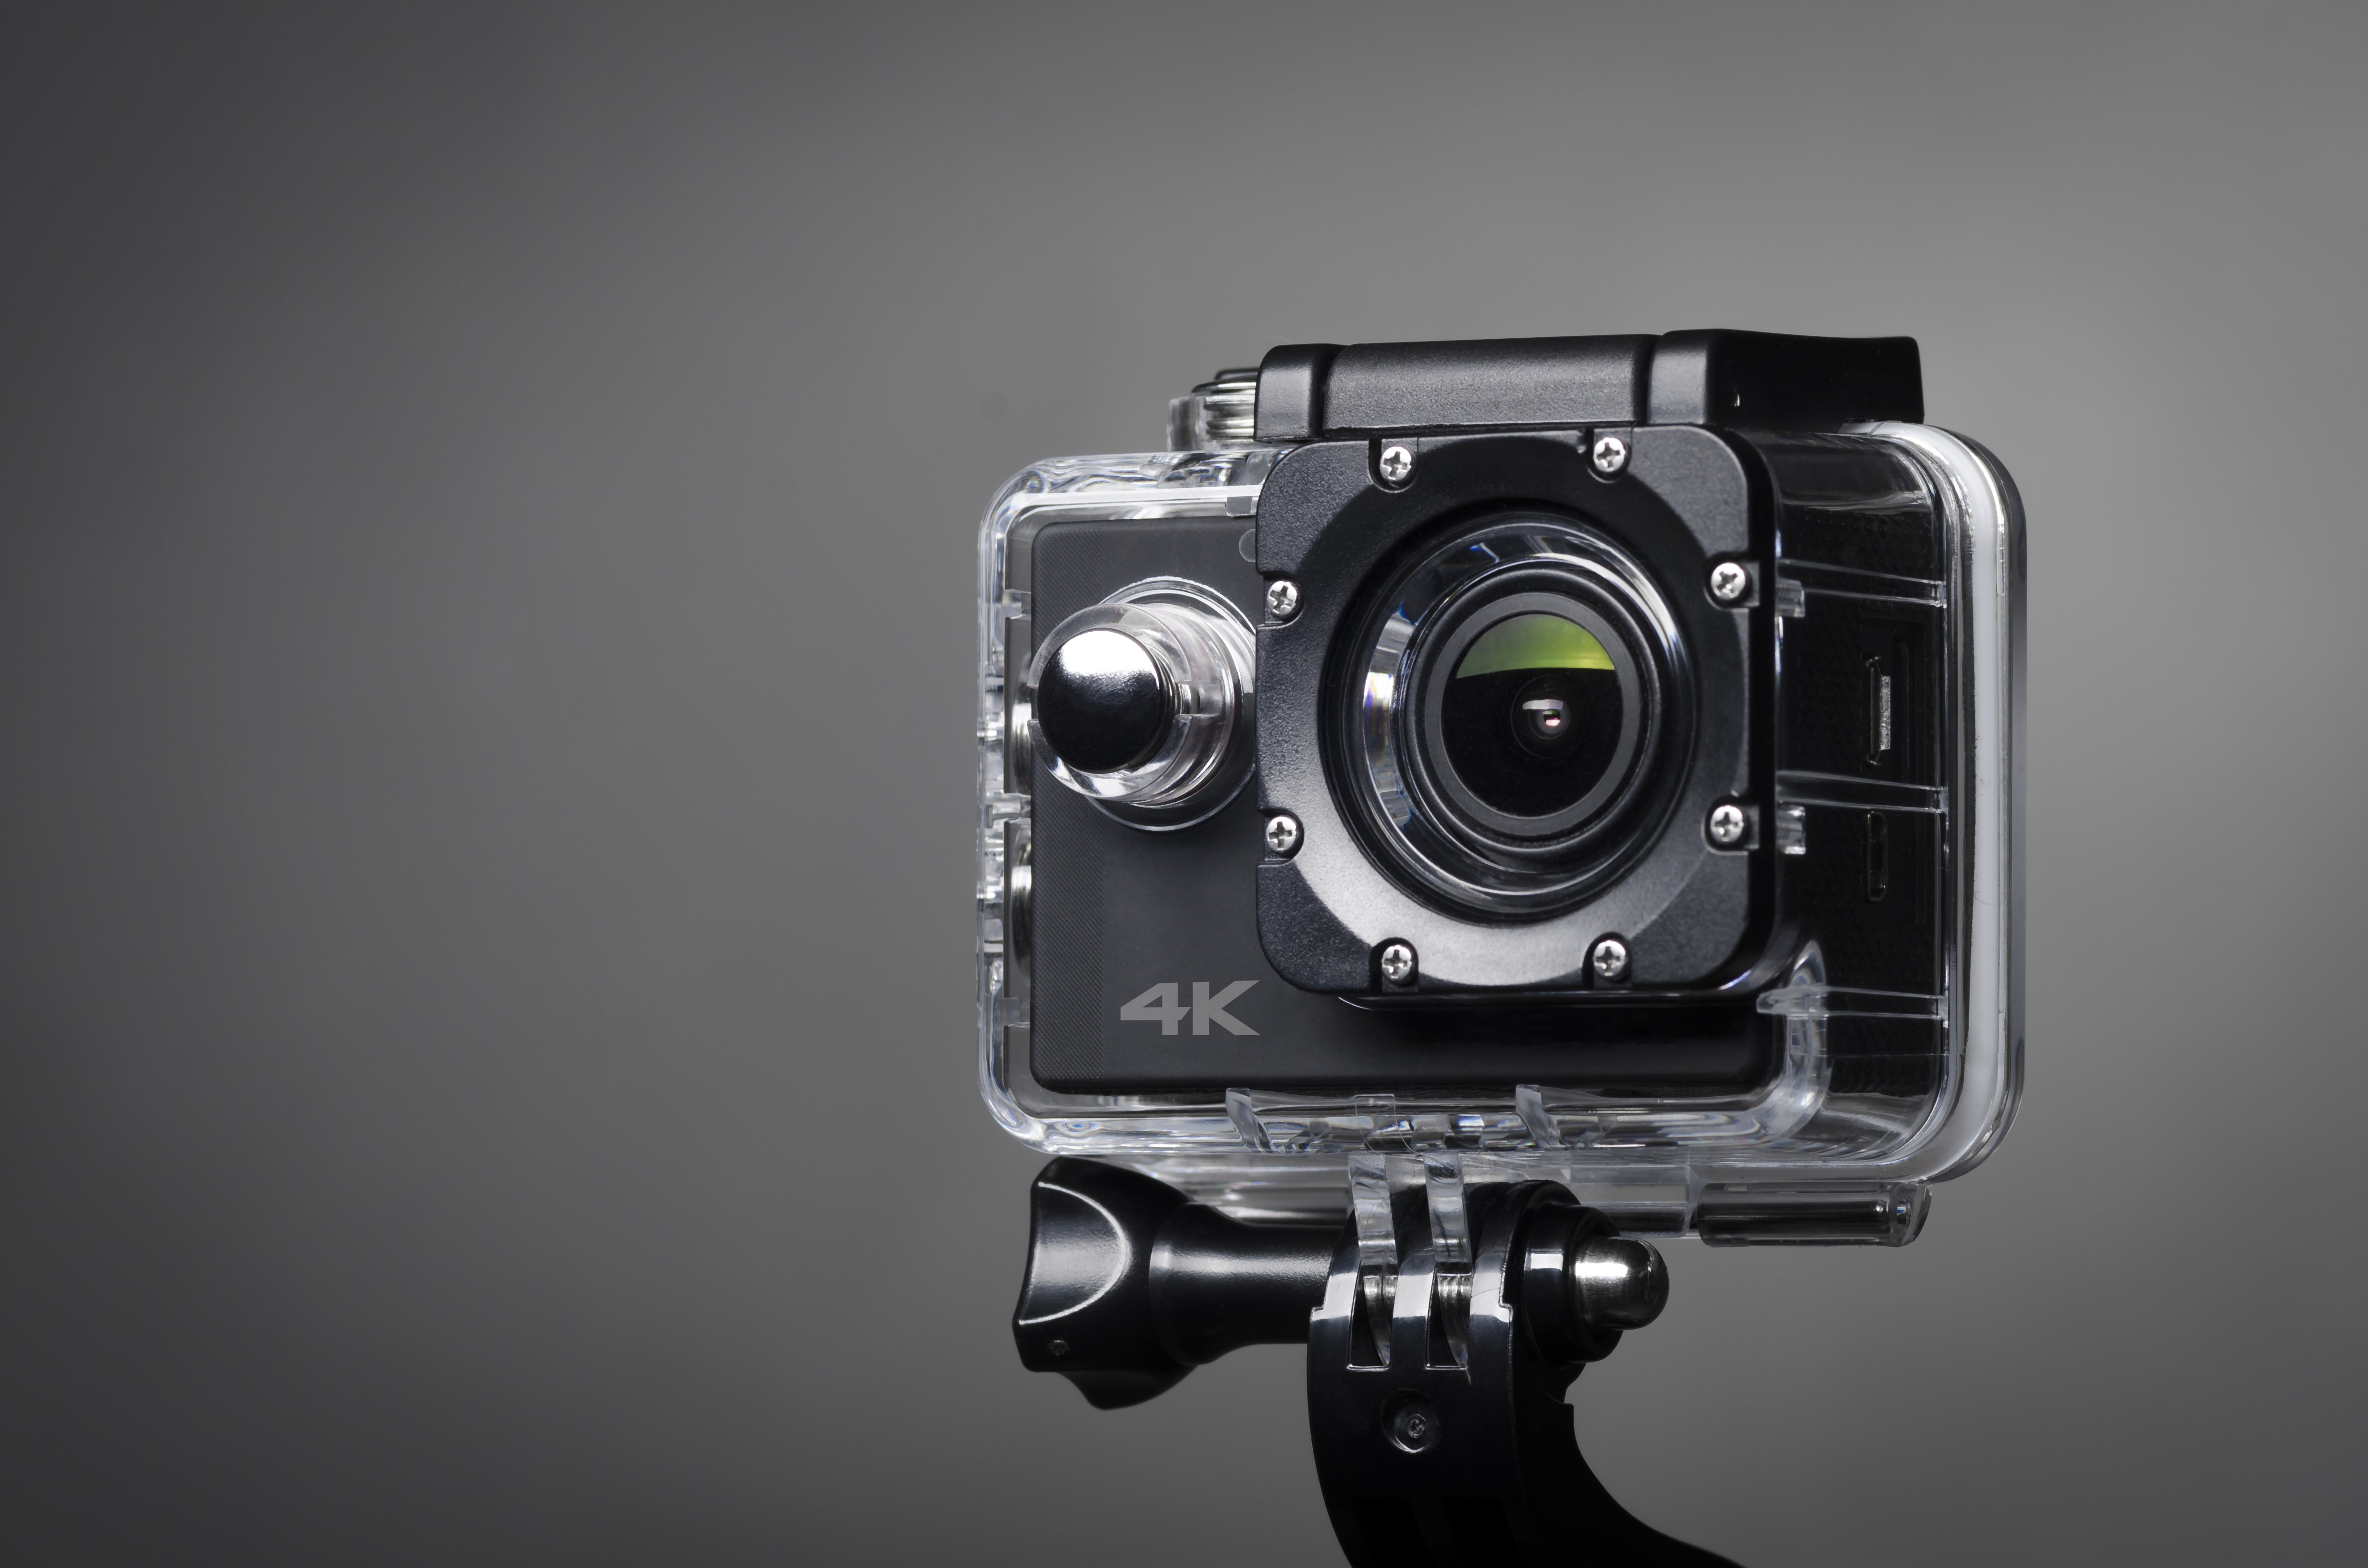 Kameratyp: Action Cam